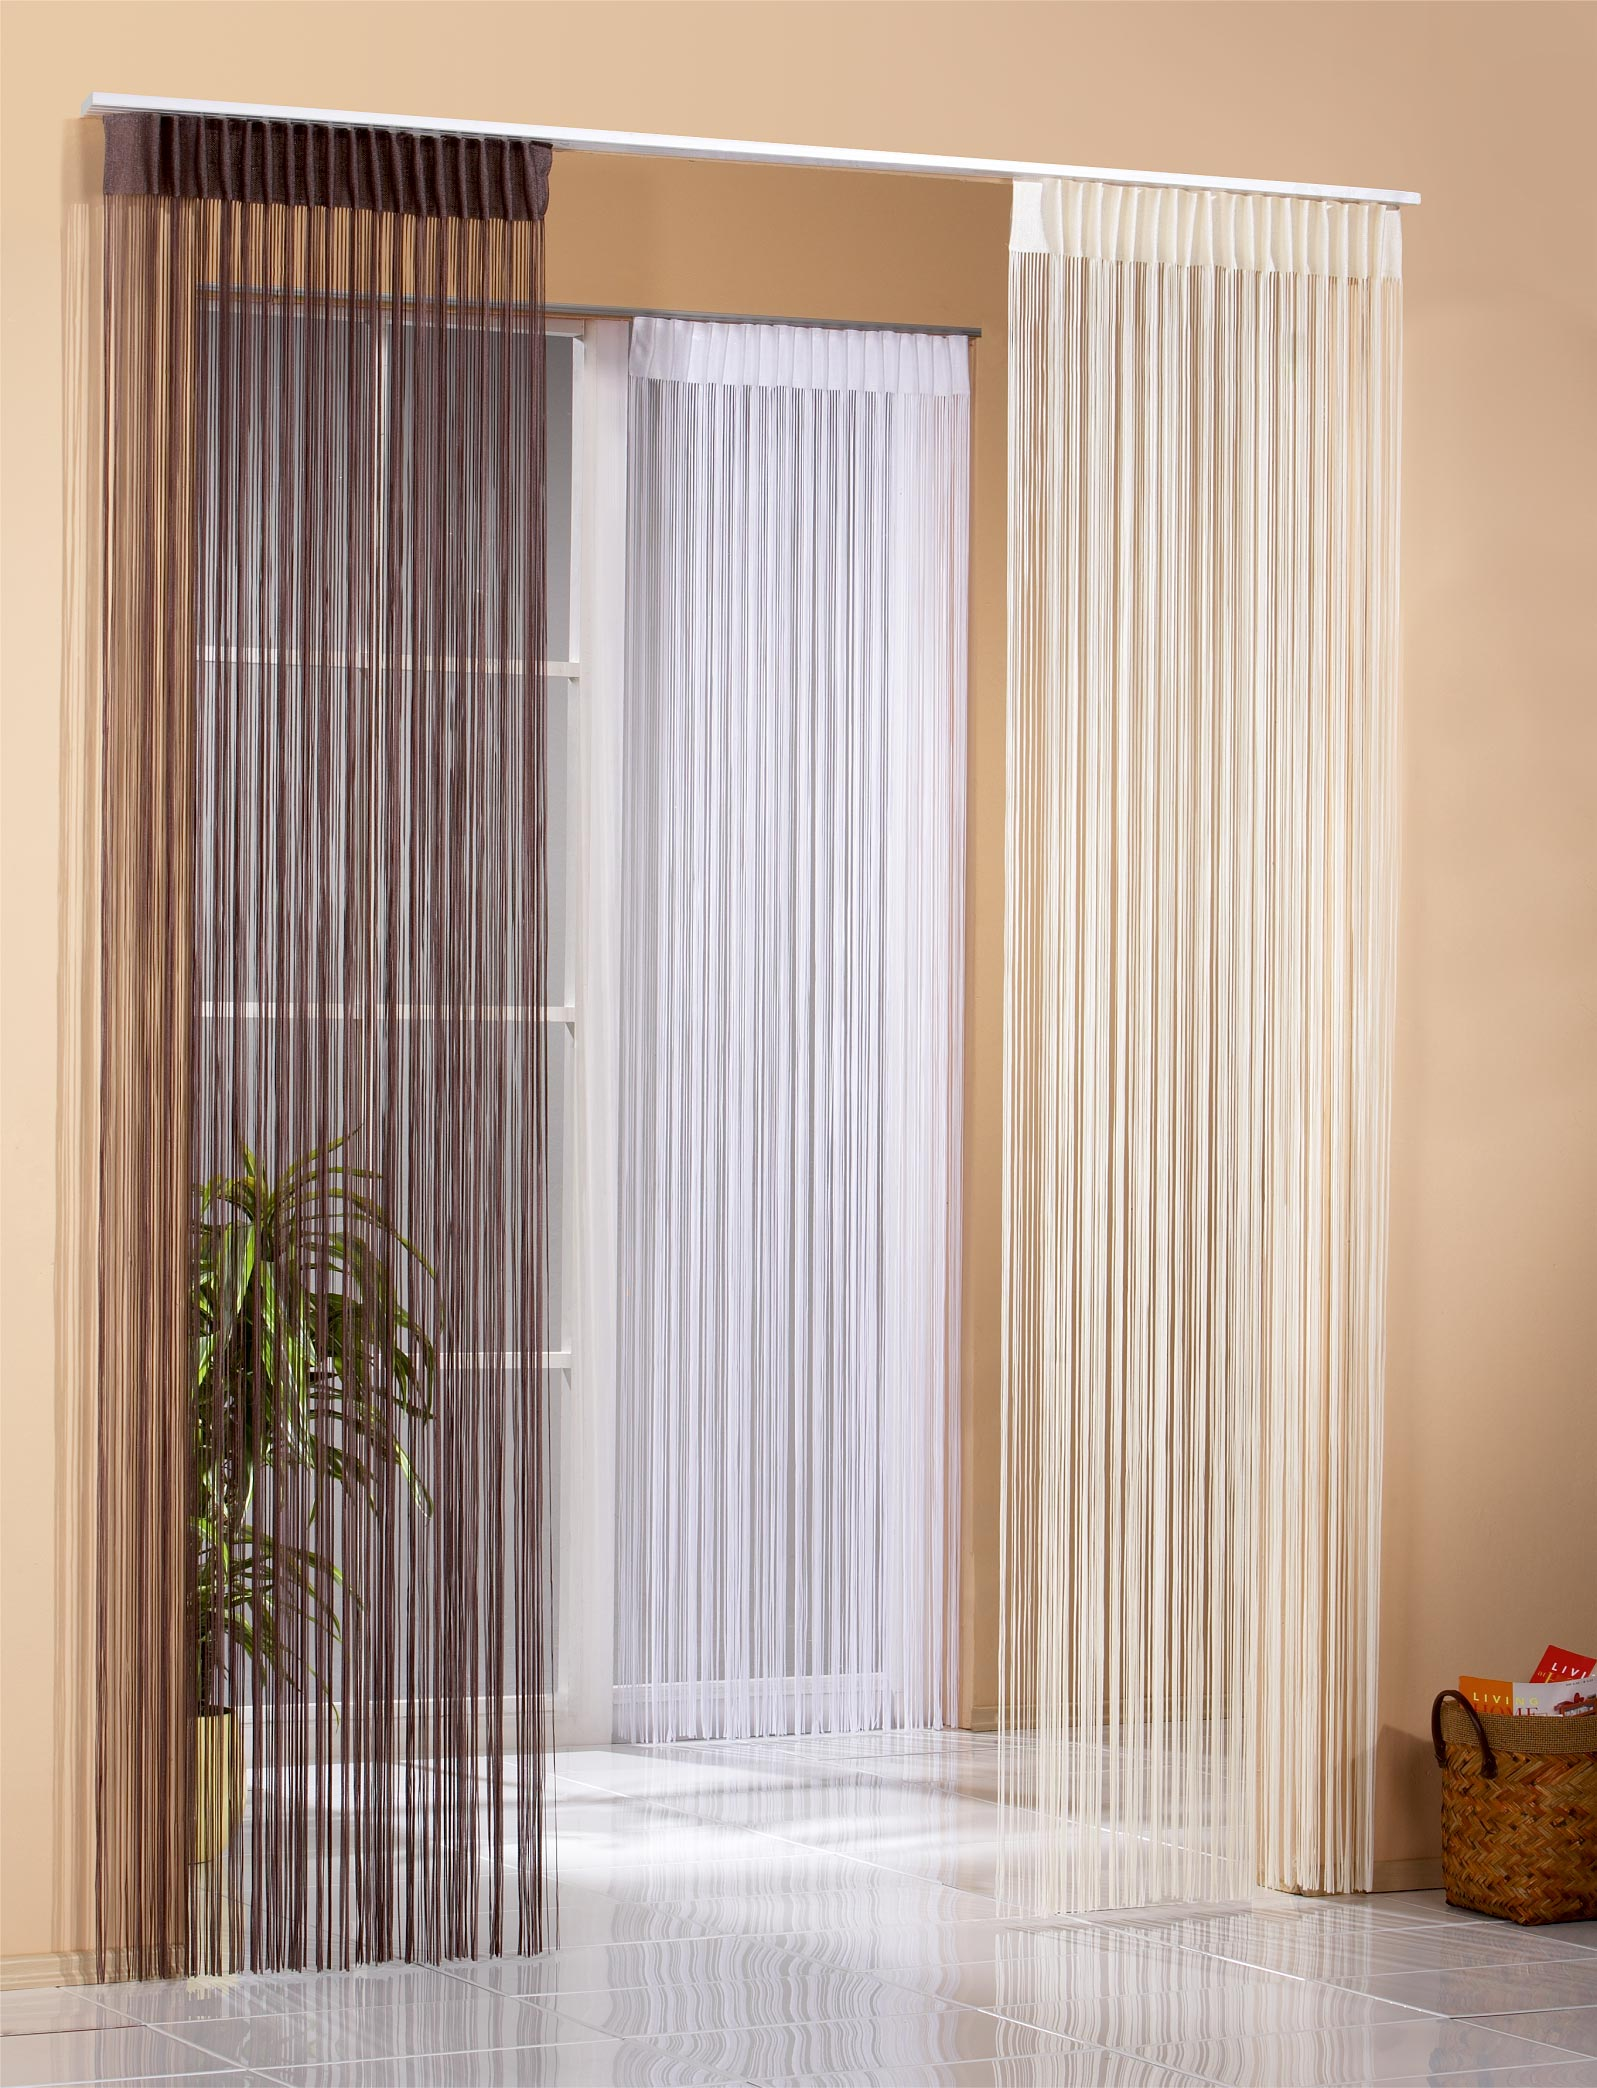 fadenstore fertiggardinen vorh nge gardinen vorh nge bn gardinen online shop. Black Bedroom Furniture Sets. Home Design Ideas